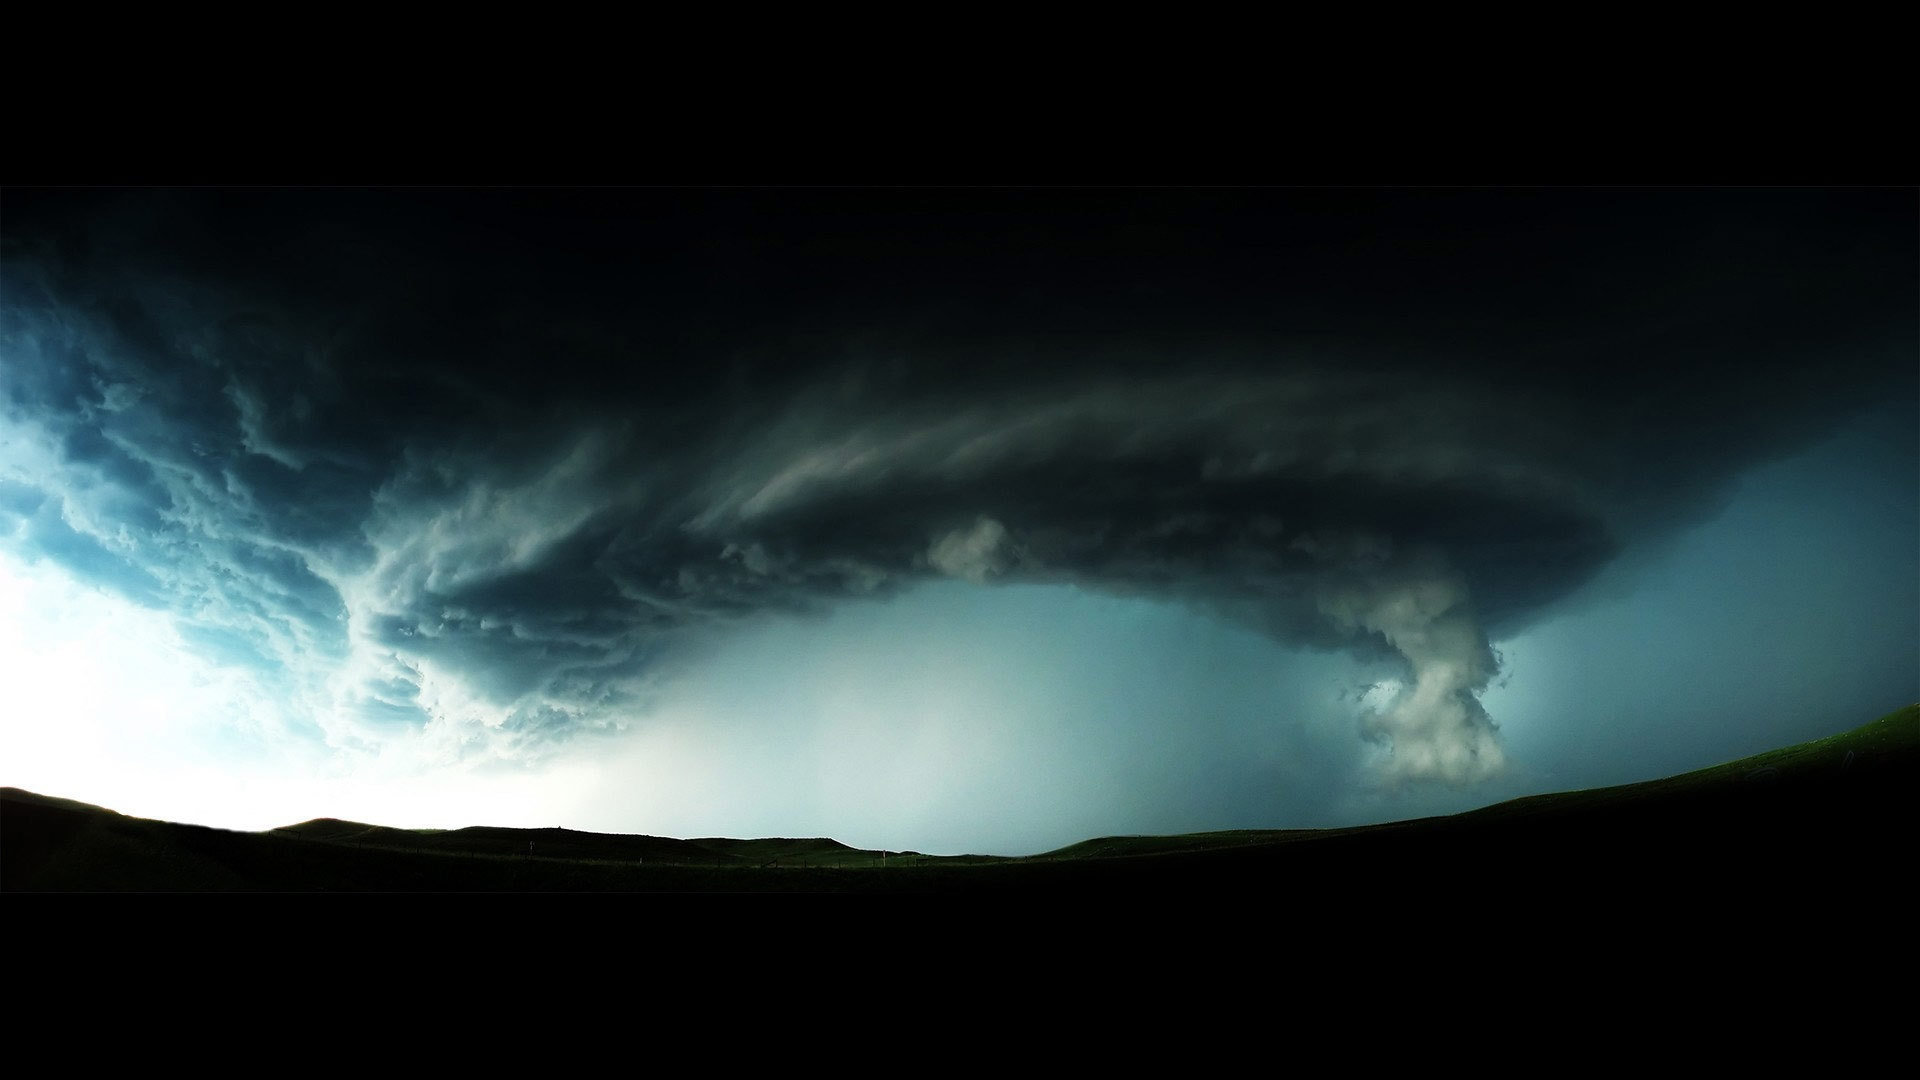 Tornado Natural Disaster Danger